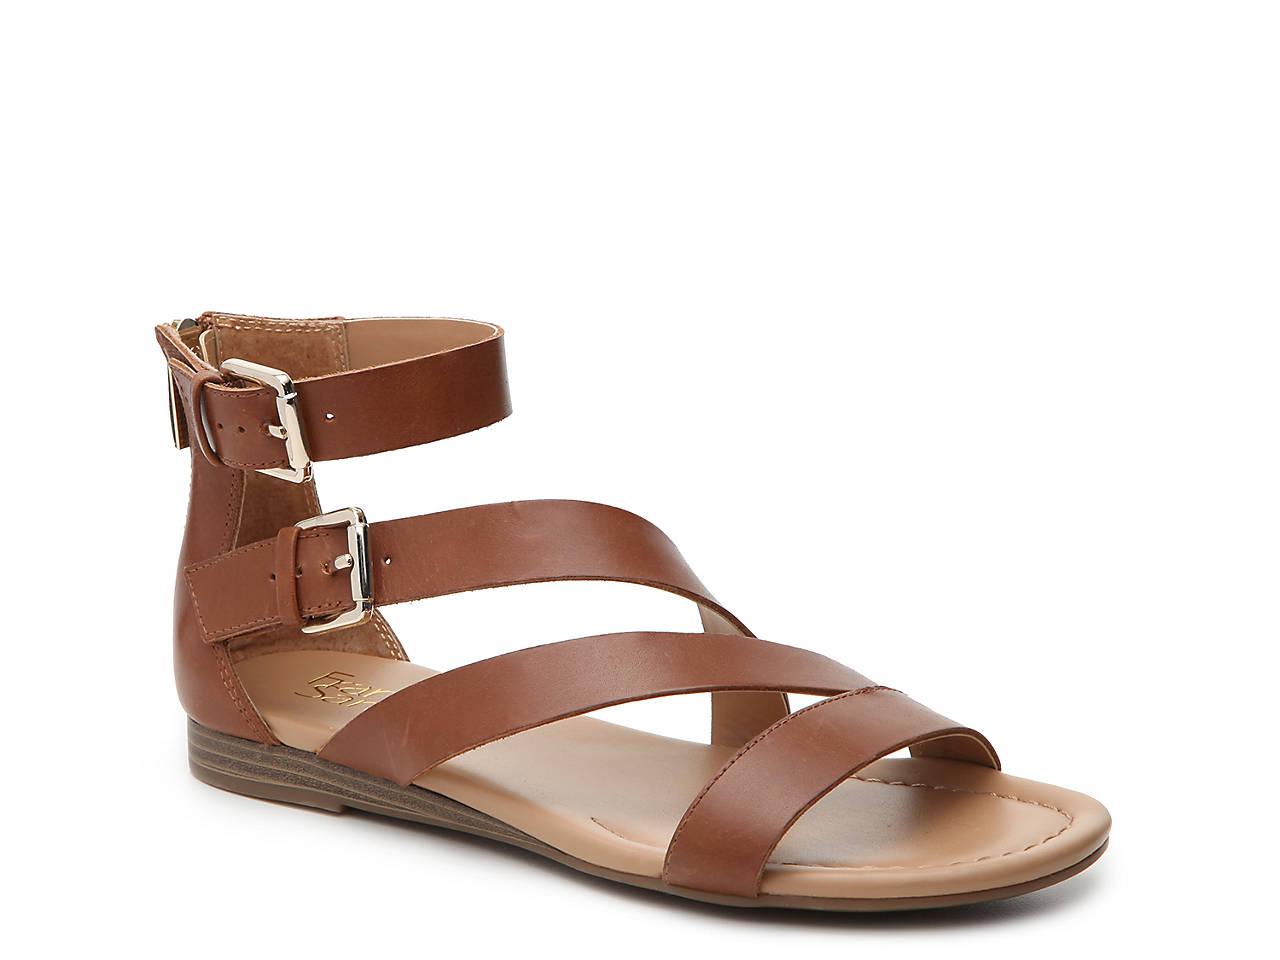 53c282242dcb Franco Sarto Greta Gladiator Sandal Women s Shoes